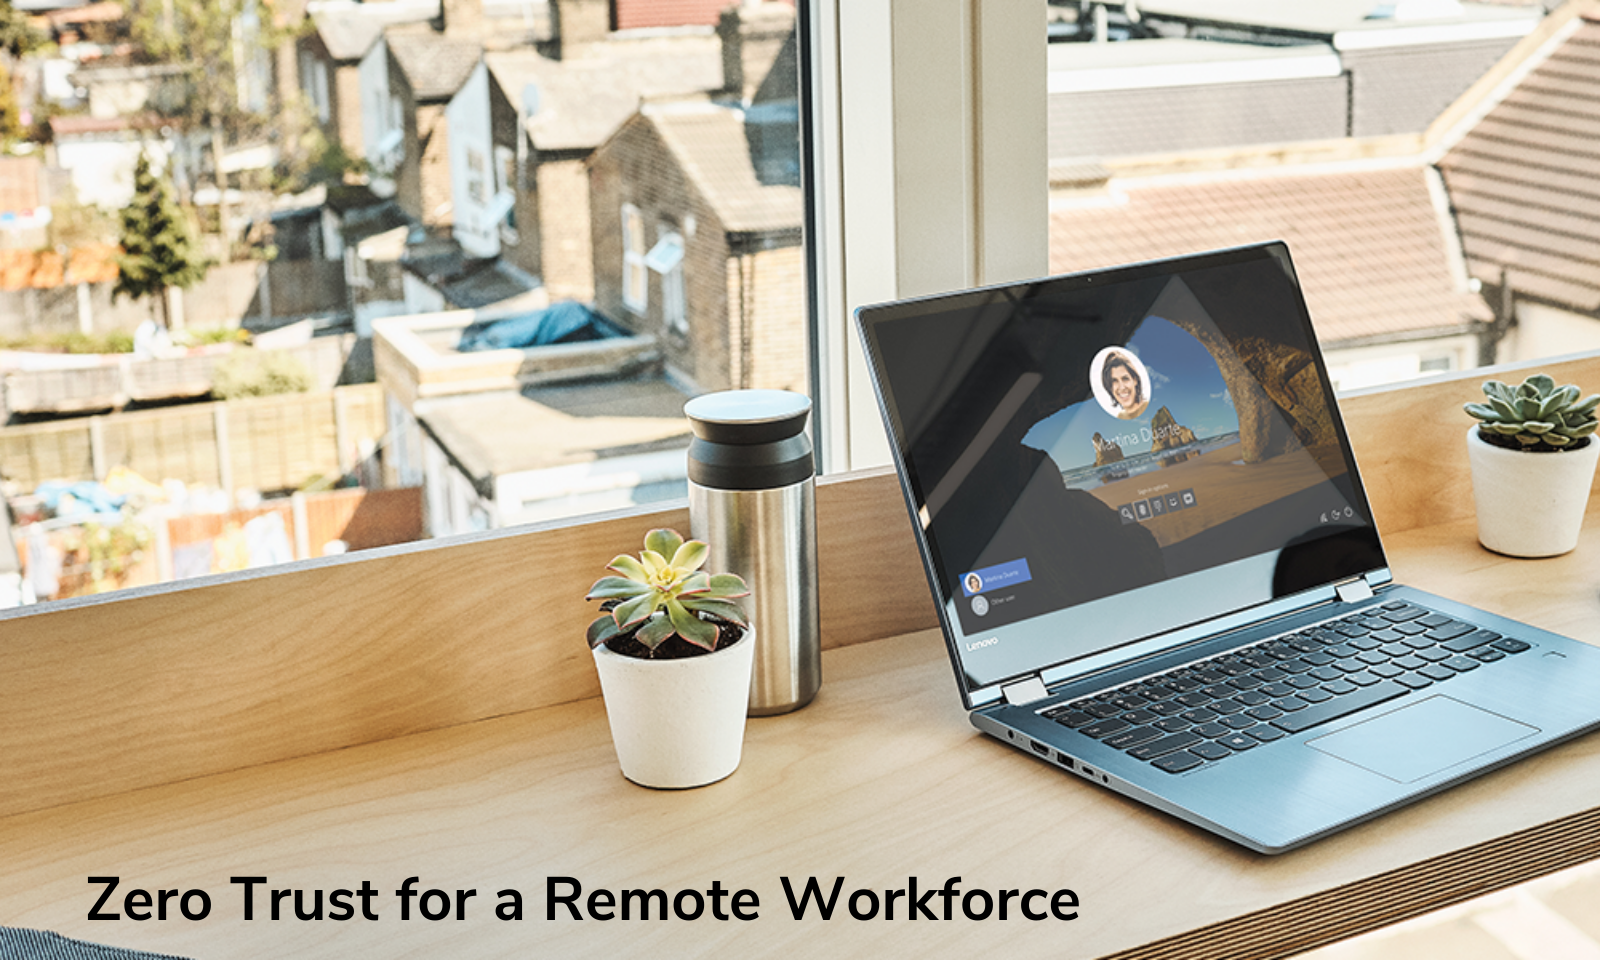 Zero Trust for a Remote Workforce